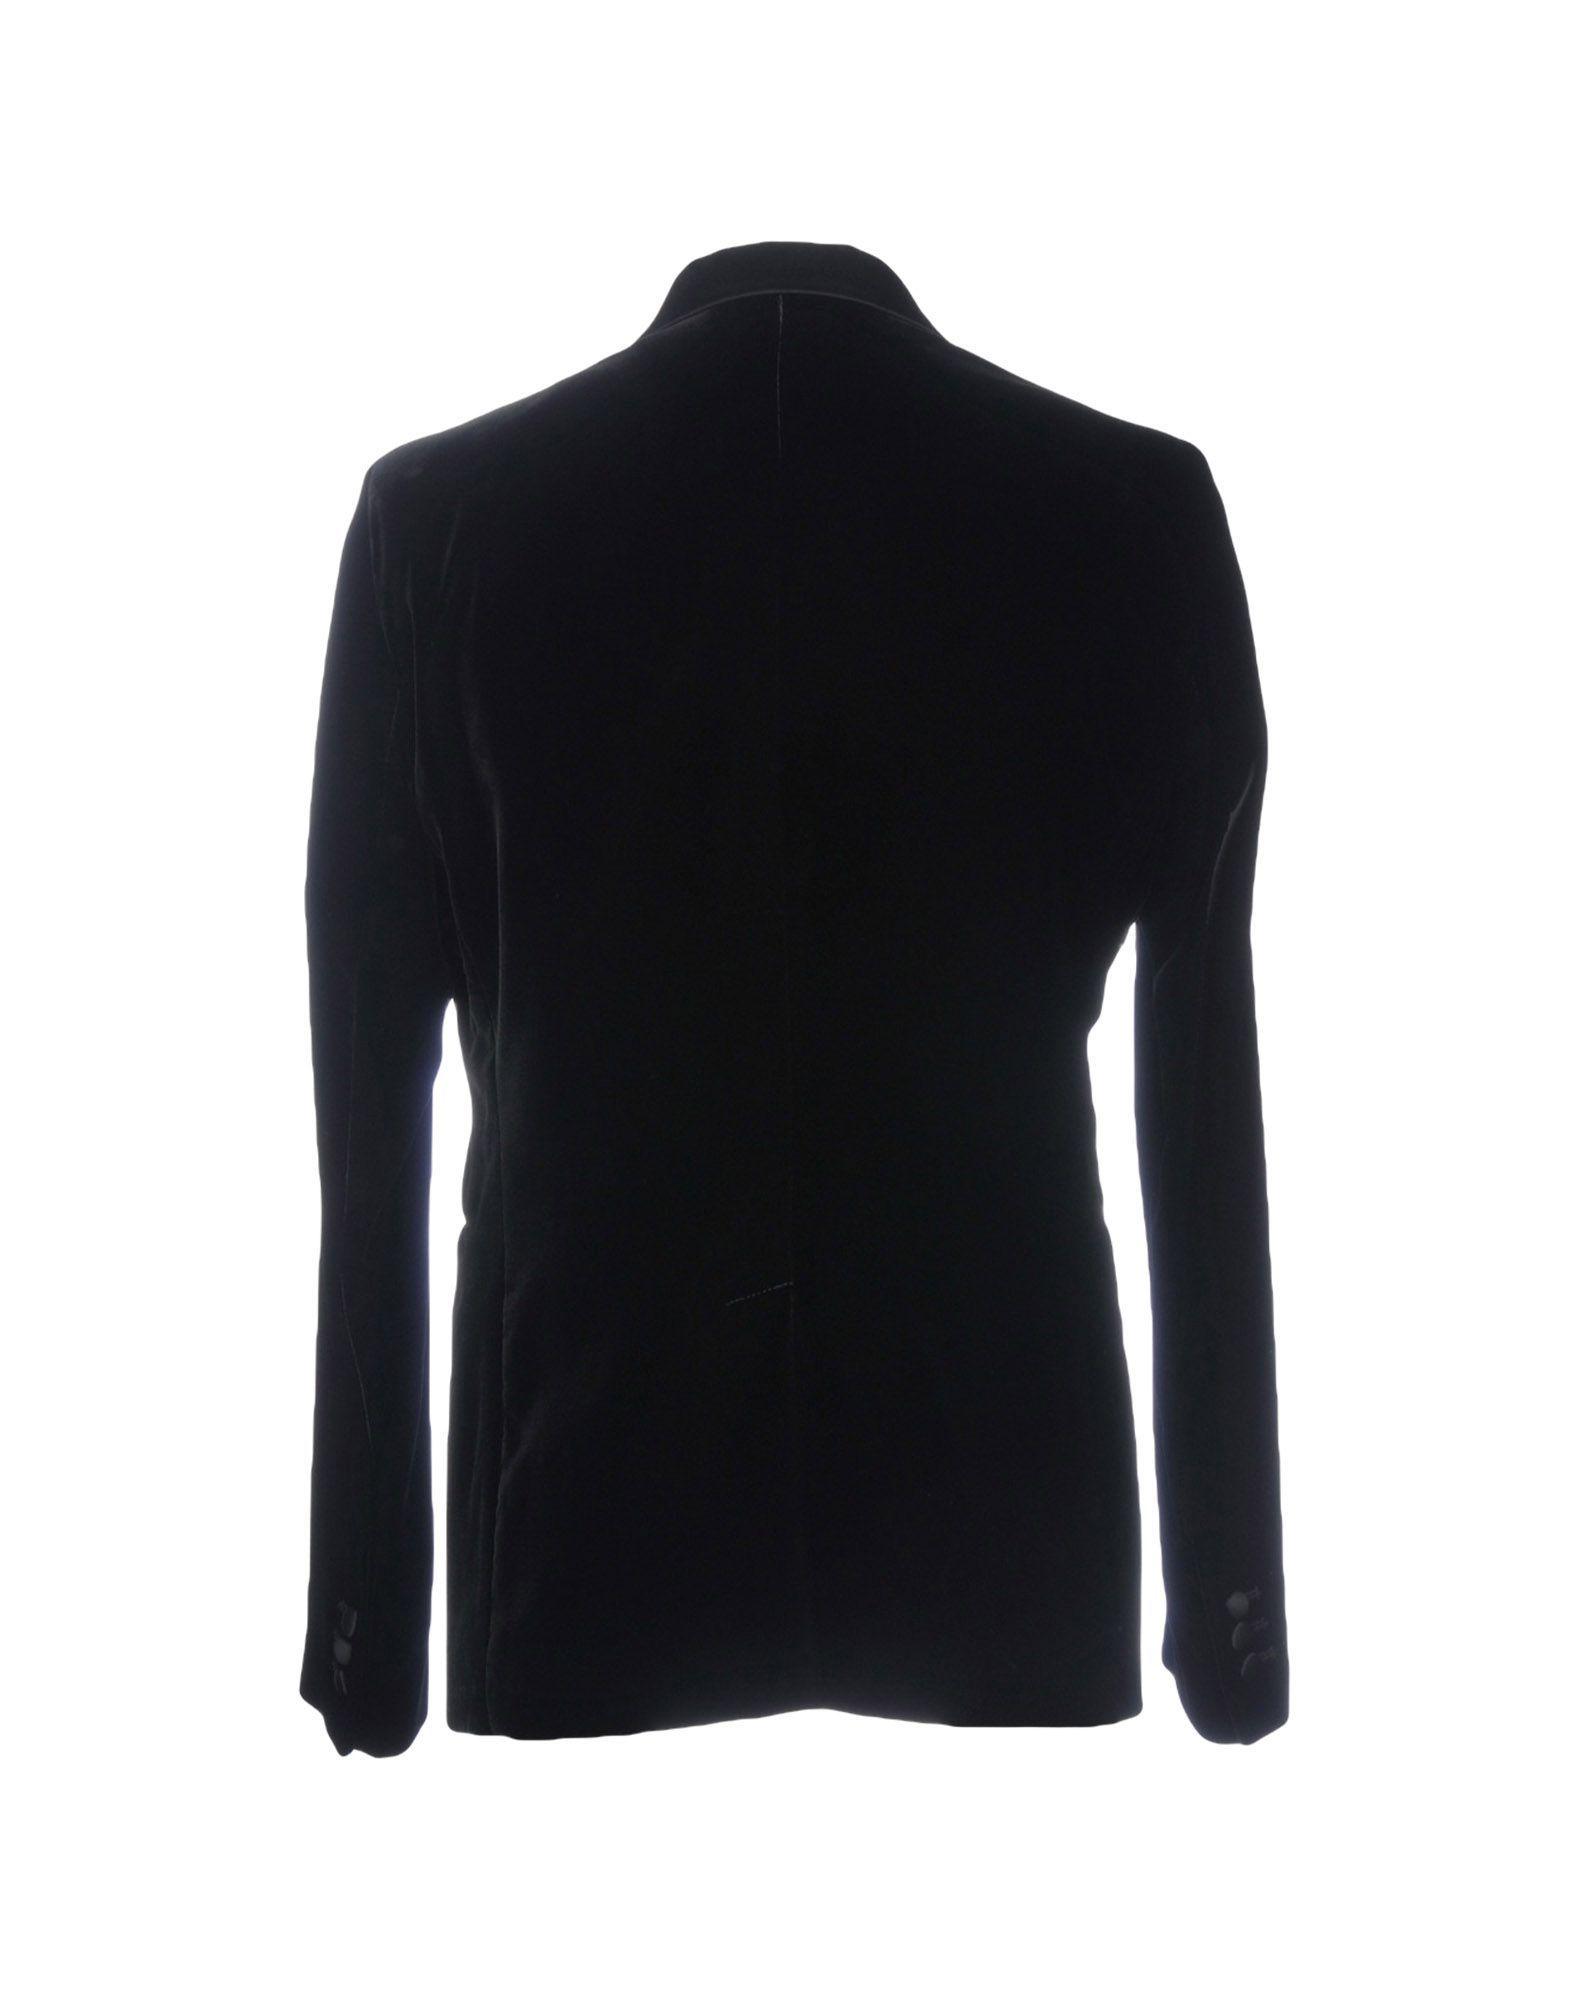 Emporio Armani Black Velvet Double Breasted Jacket